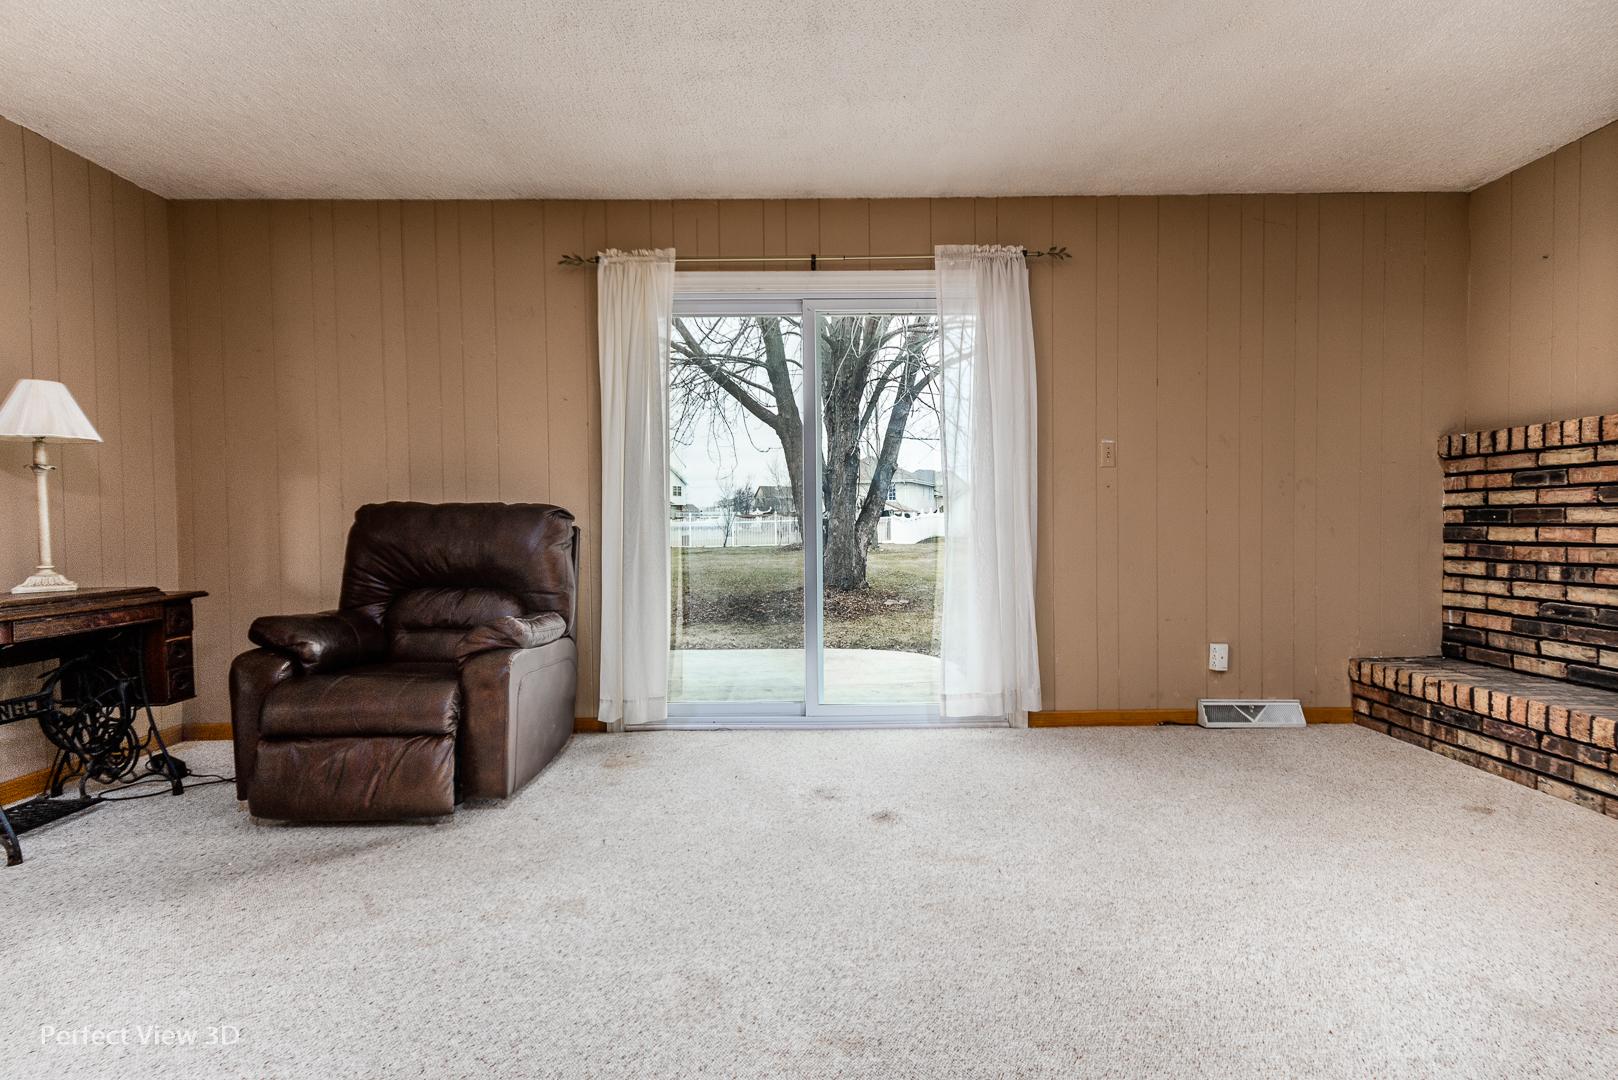 711 Wagon ,New Lenox, Illinois 60451